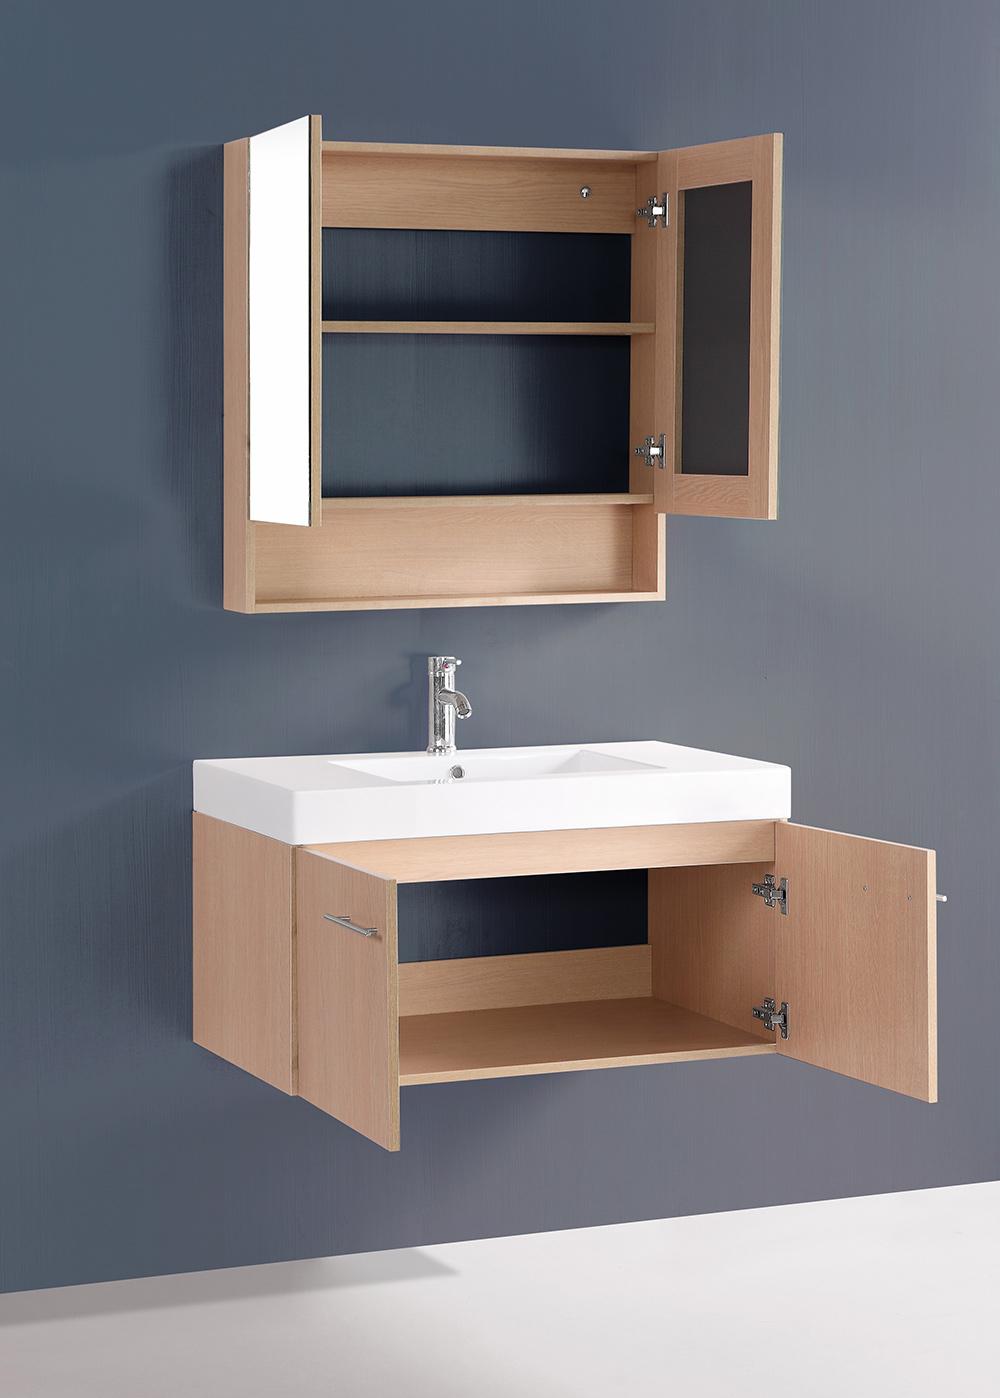 Narrow Depth Bathroom Vanity.  Narrow Depth Vanity 15 To 20 In Dept Space Saving